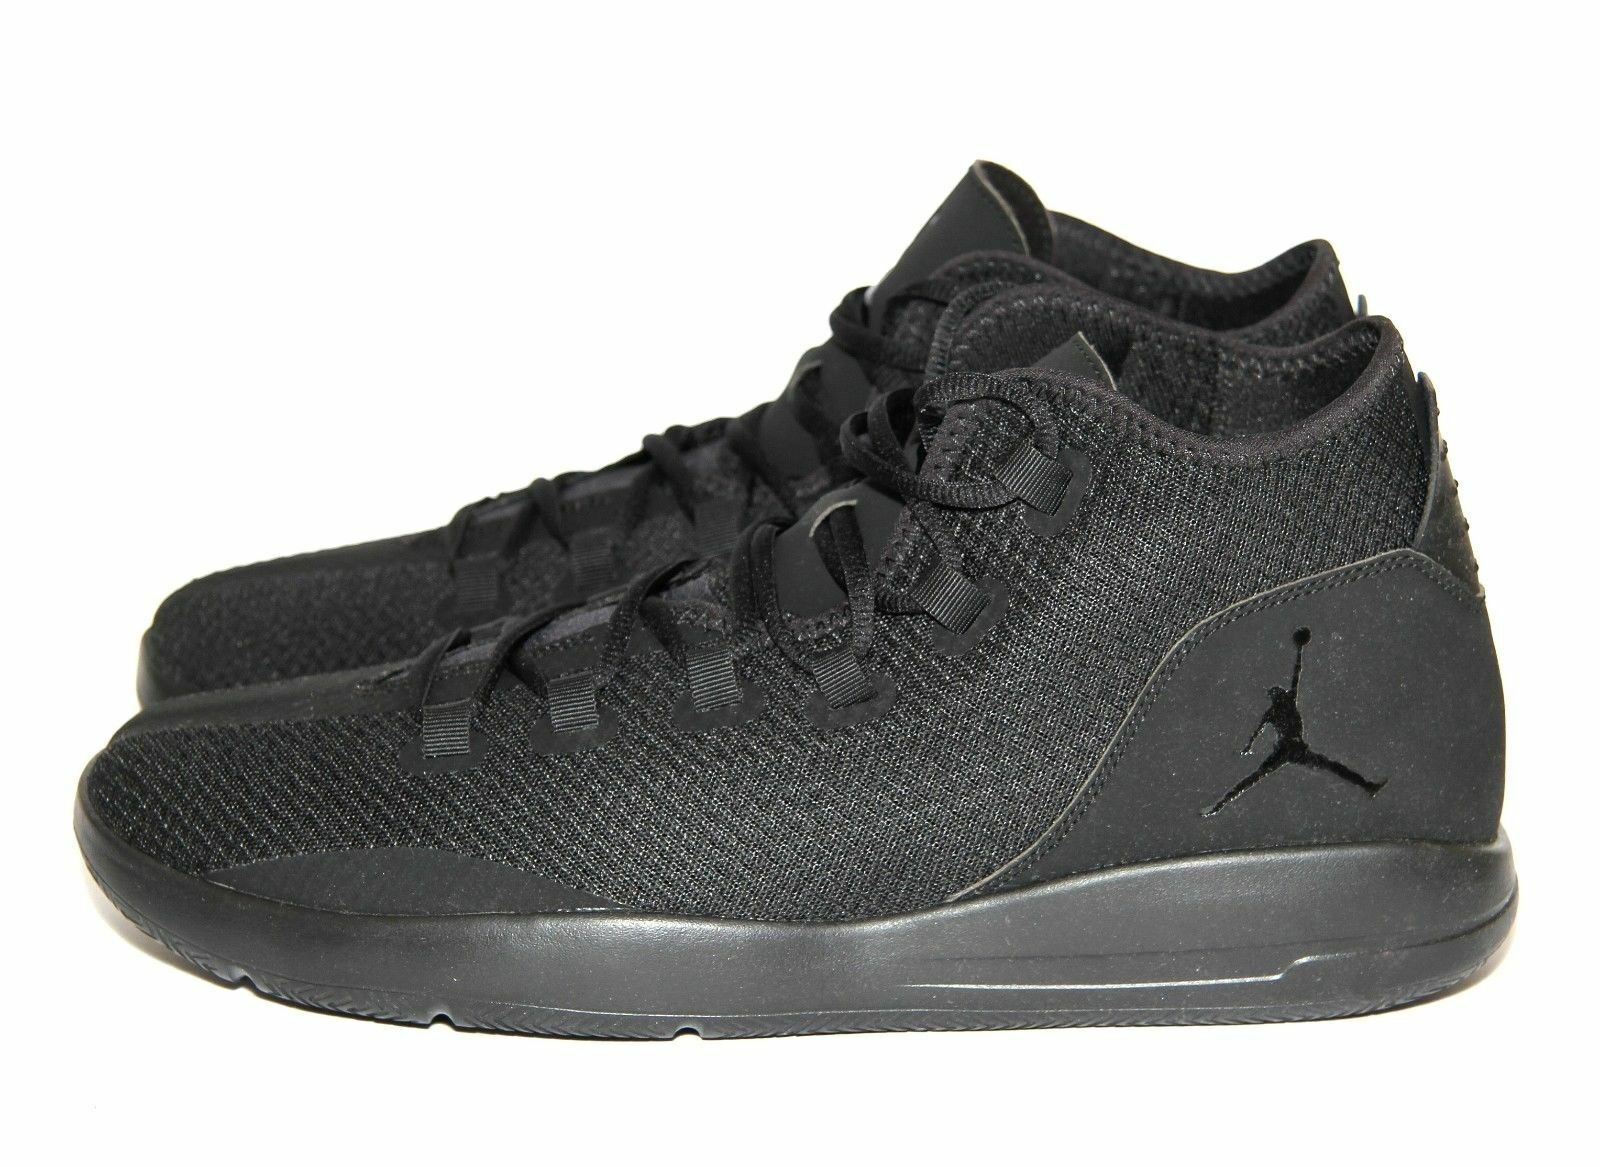 NEW Nike Jordan Reveal Men's 11.5 shoes Black Athletic Jumpman Sneaker